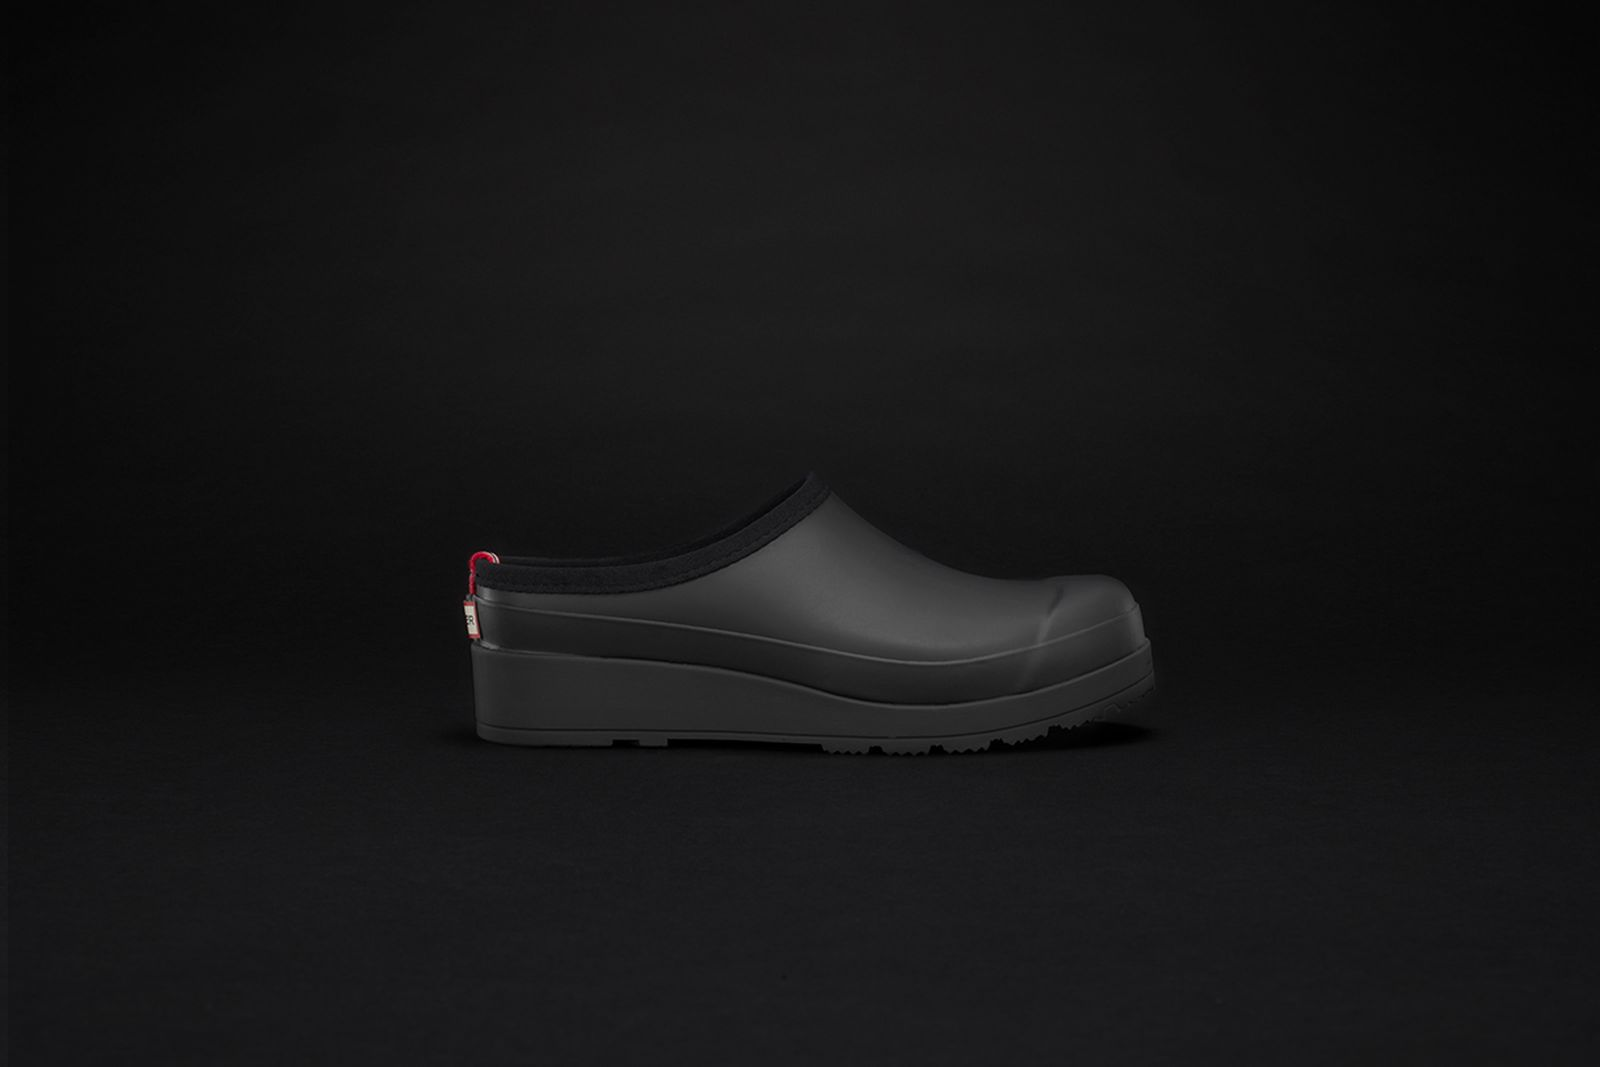 pharrell-adidas-hu-nmd-pink-release-info-3-06